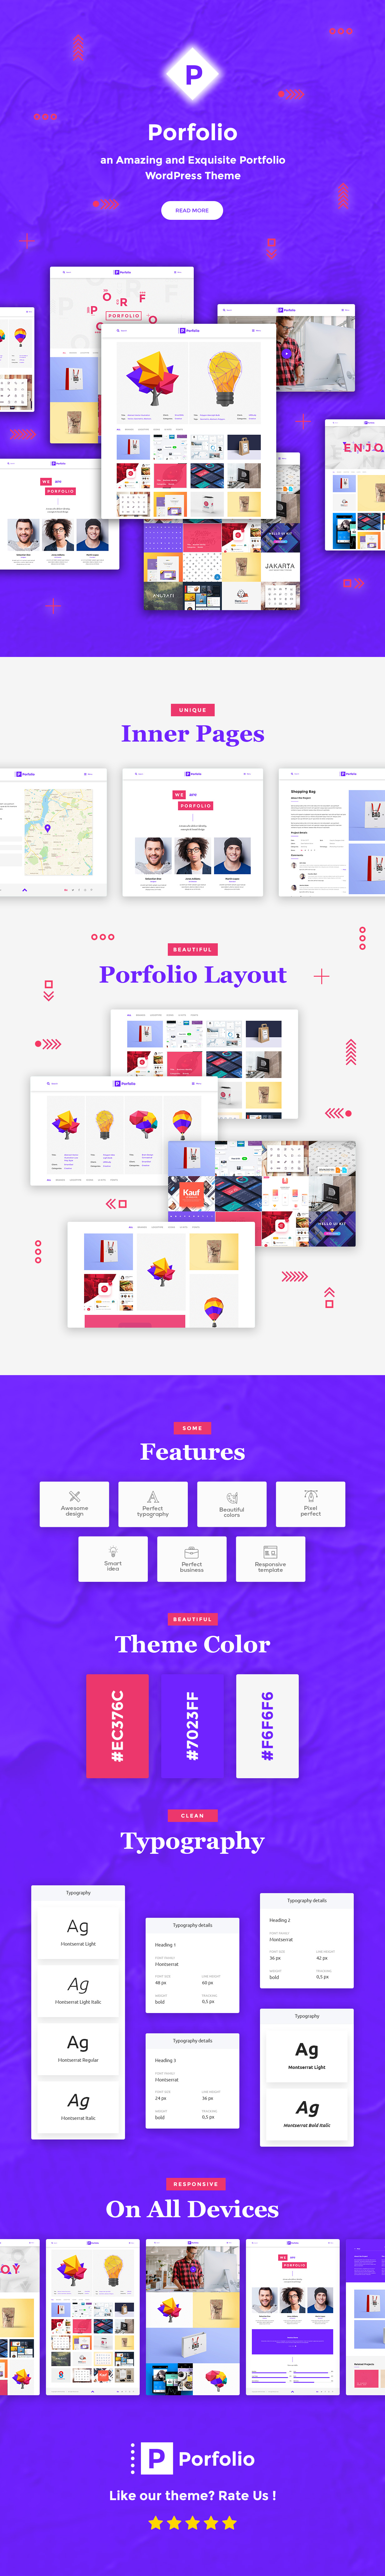 Porfolio - Creative Agency & Personal Portfolio WordPress Theme - 2